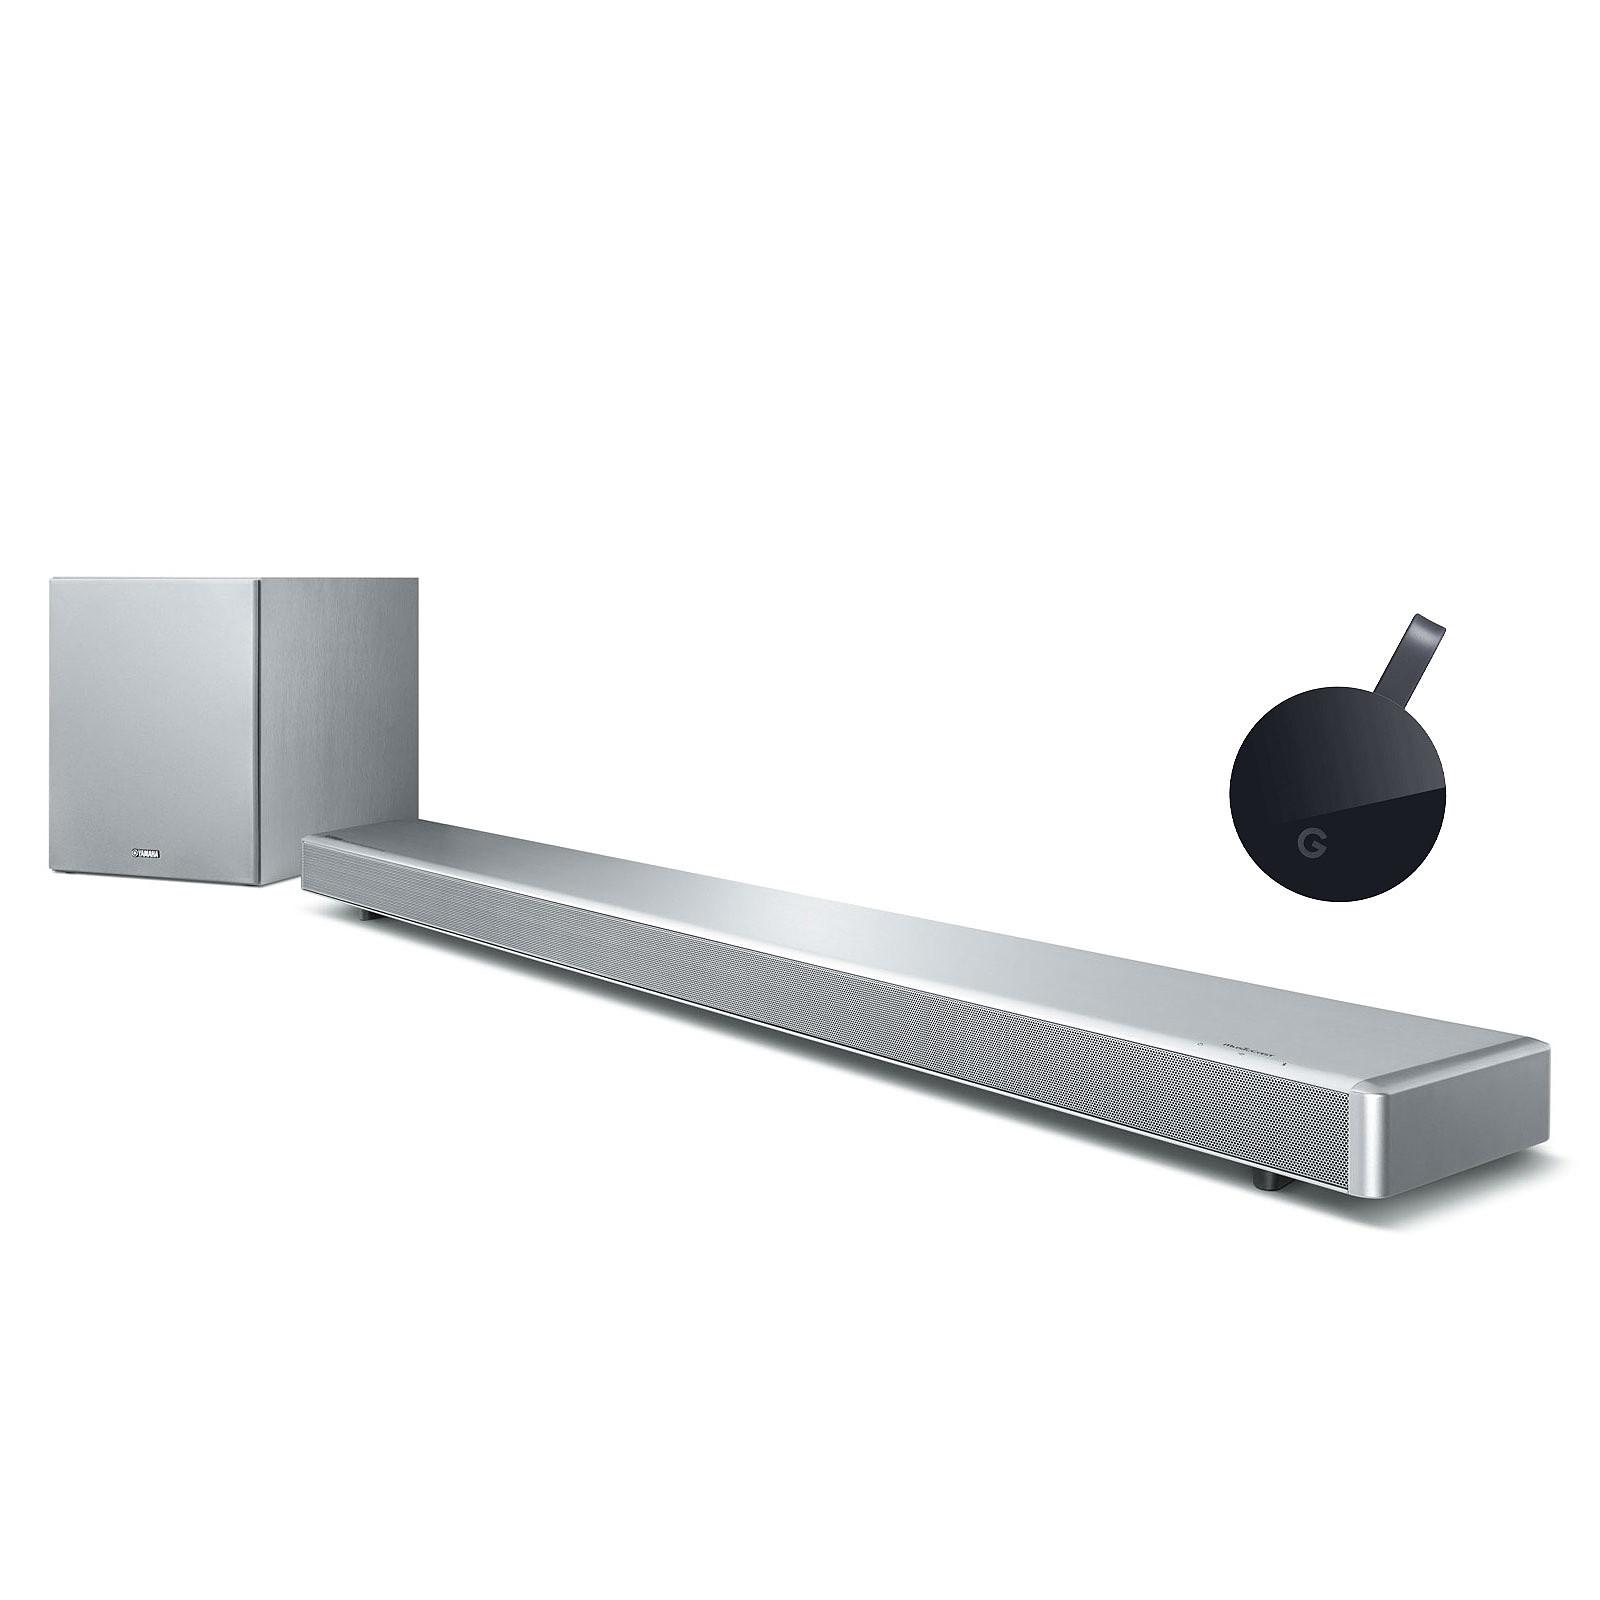 Yamaha MusicCast YSP-2700 Argent + Google Chromecast Ultra